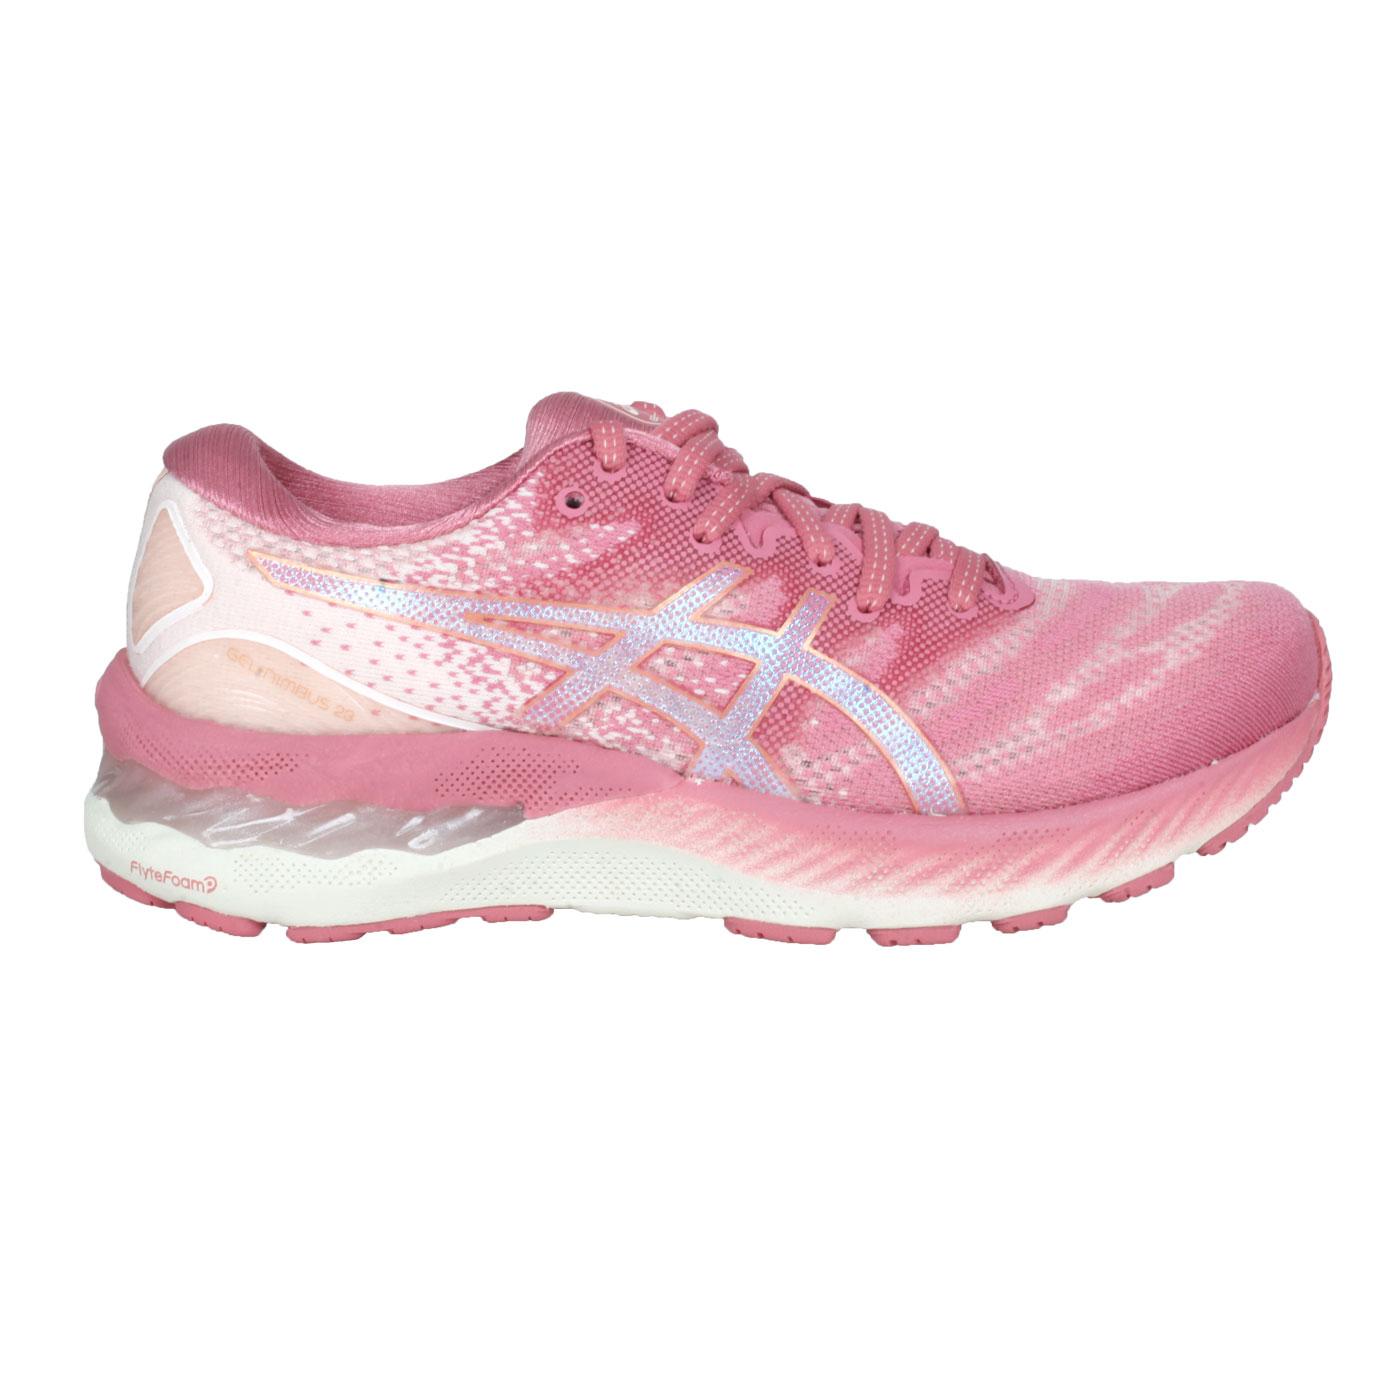 ASICS 女款慢跑鞋  @GEL-NIMBUS 23@1012A885-708